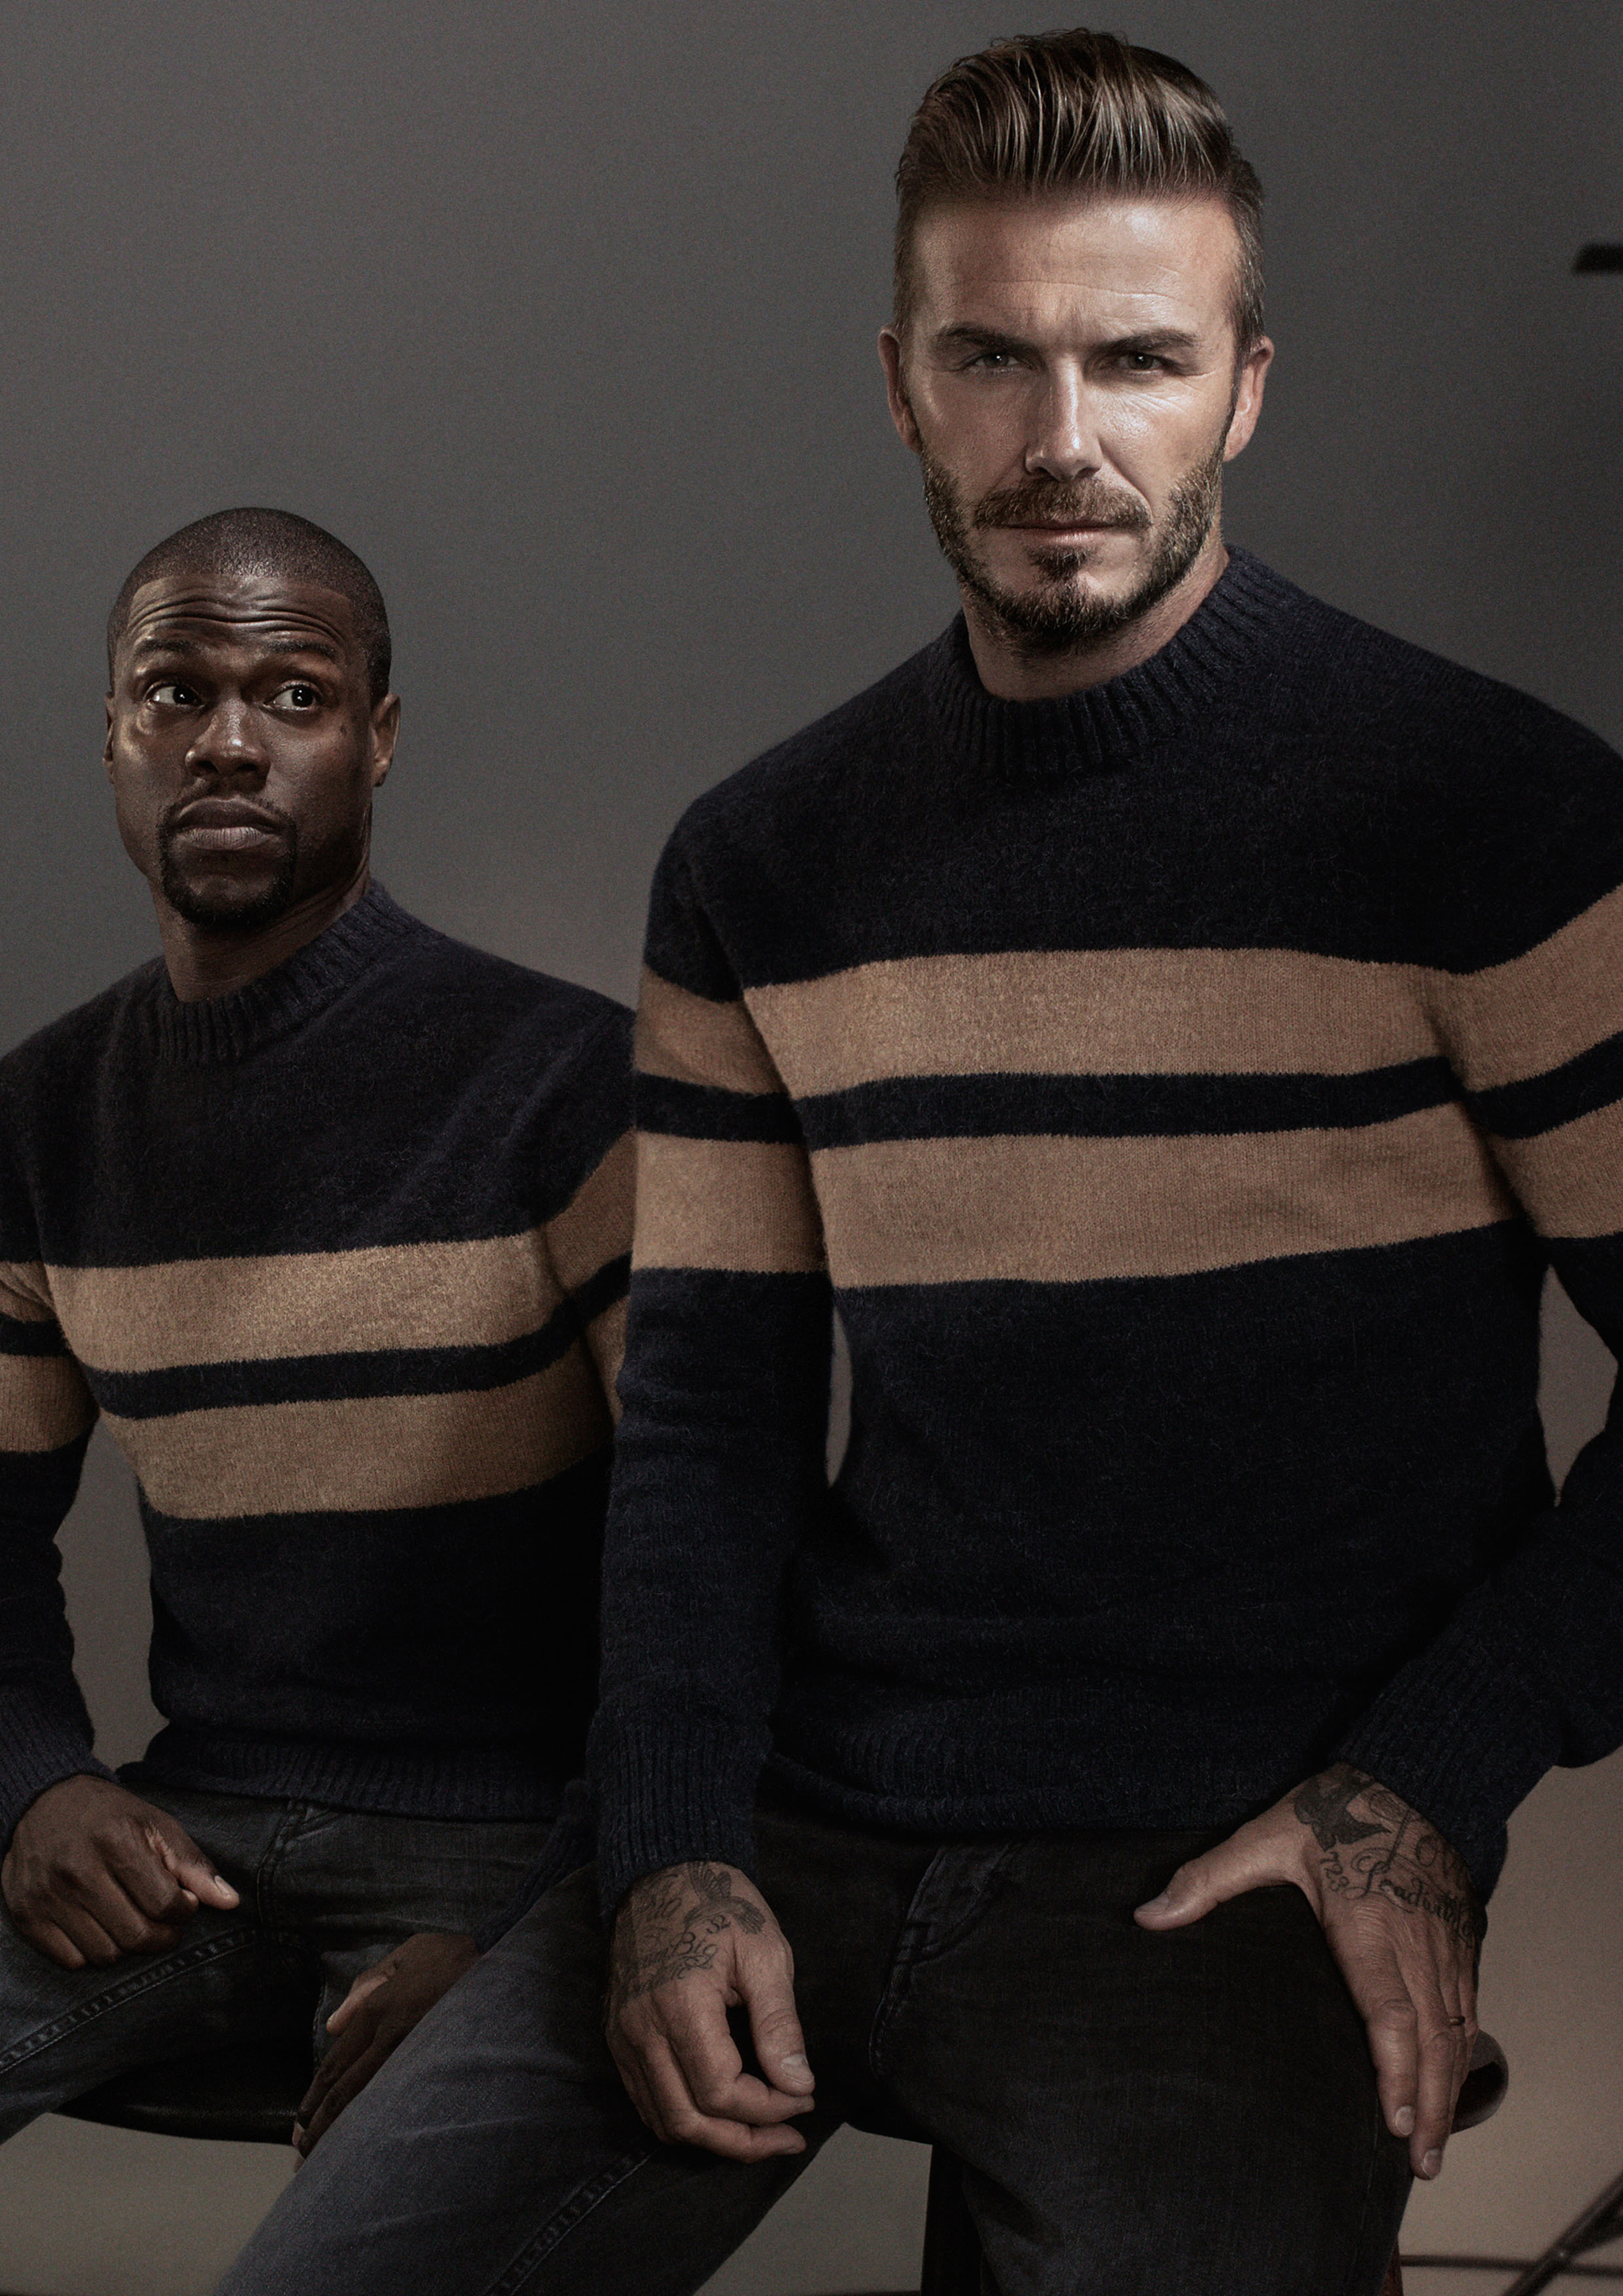 David-Beckham-Kevin-Hart-HM-01